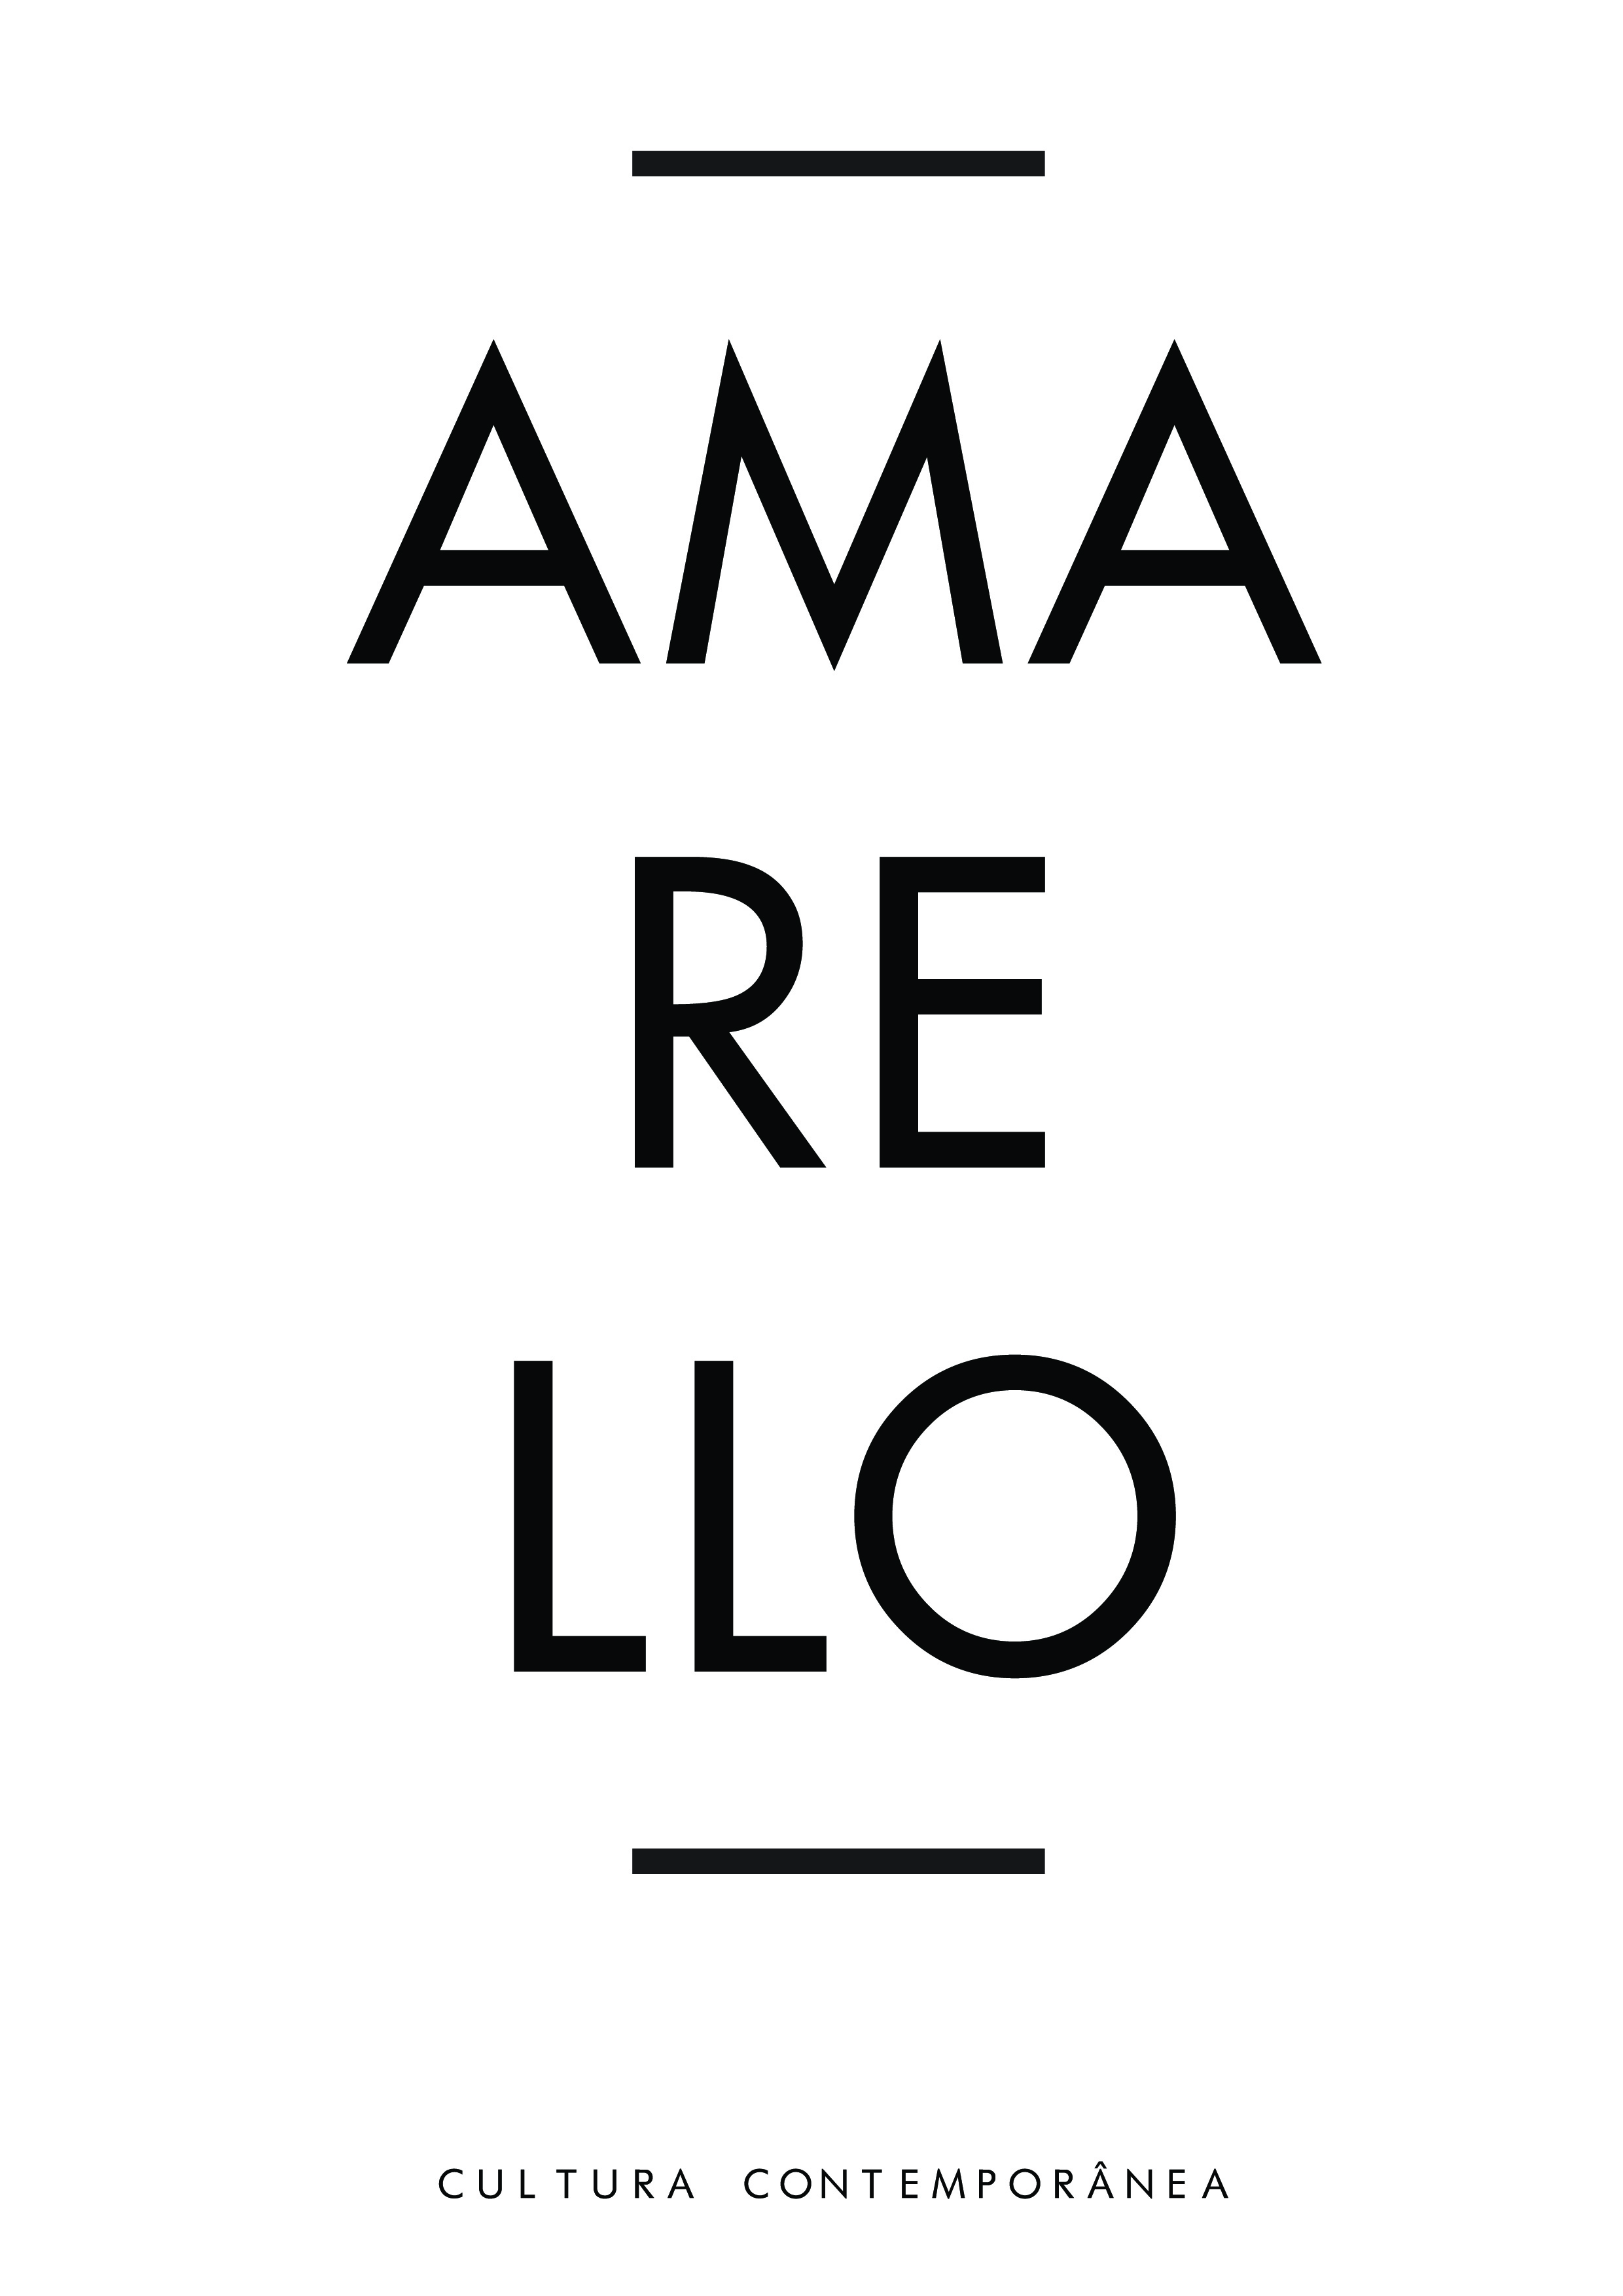 NOVO_logo_amarello_aberto_out.jpg